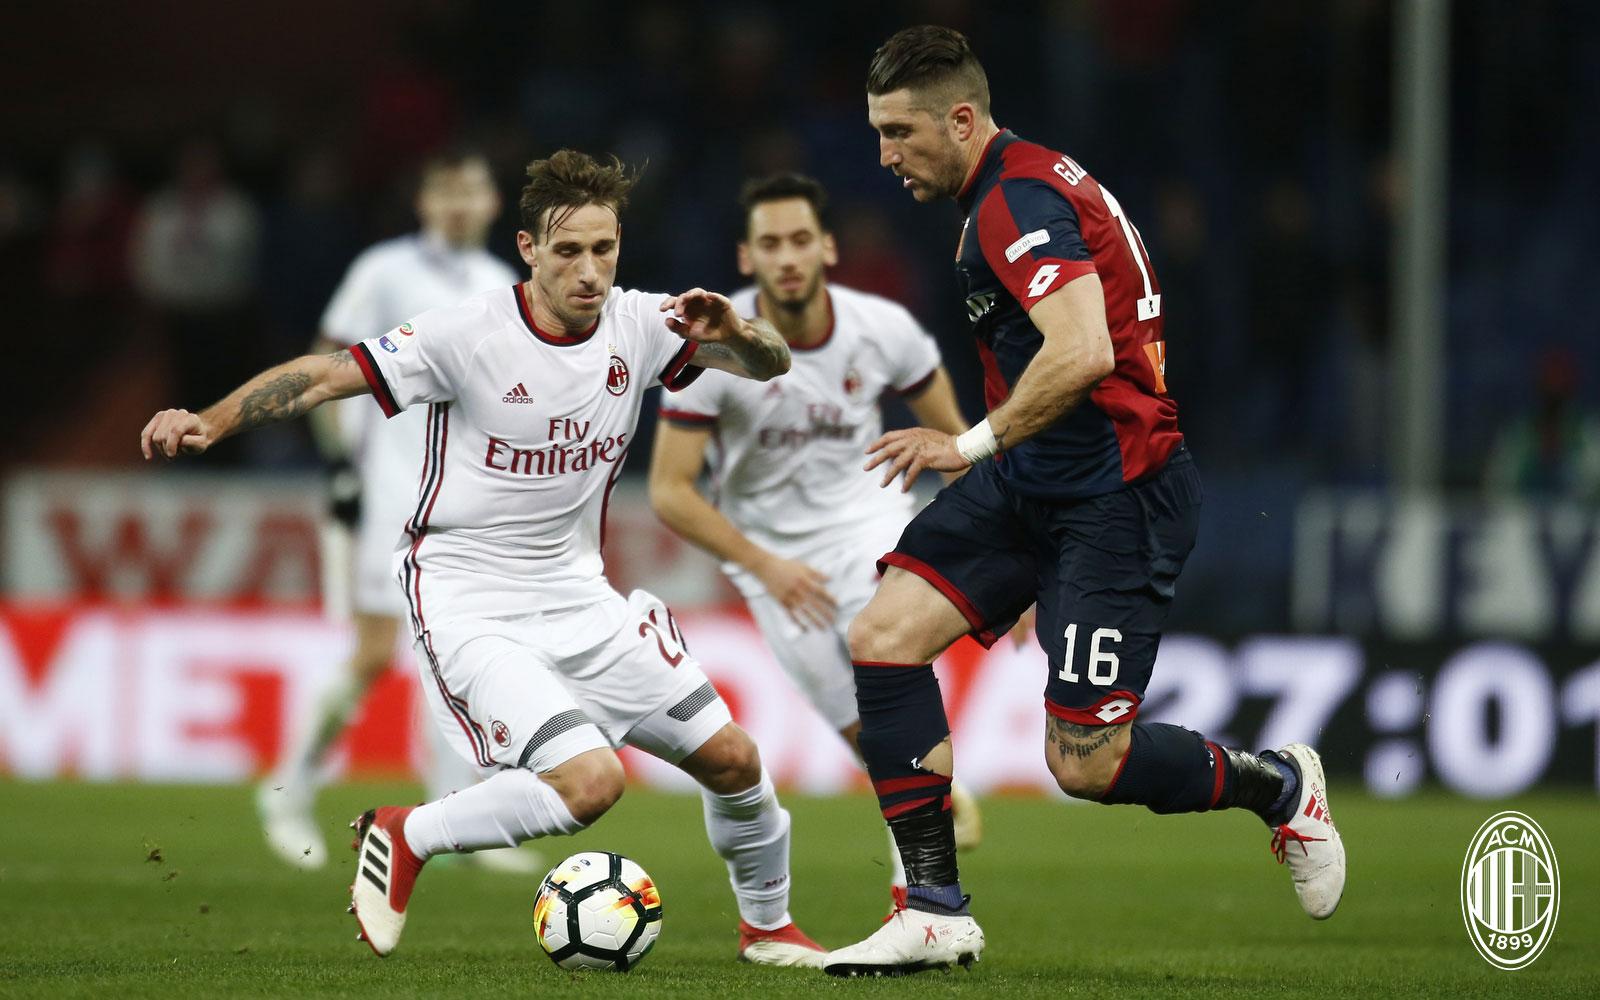 Lucas Biglia and Andrey Galabinov during Genoa-Milan at Stadio Luigi Ferraris on March 11, 2018. (@acmilan.com)